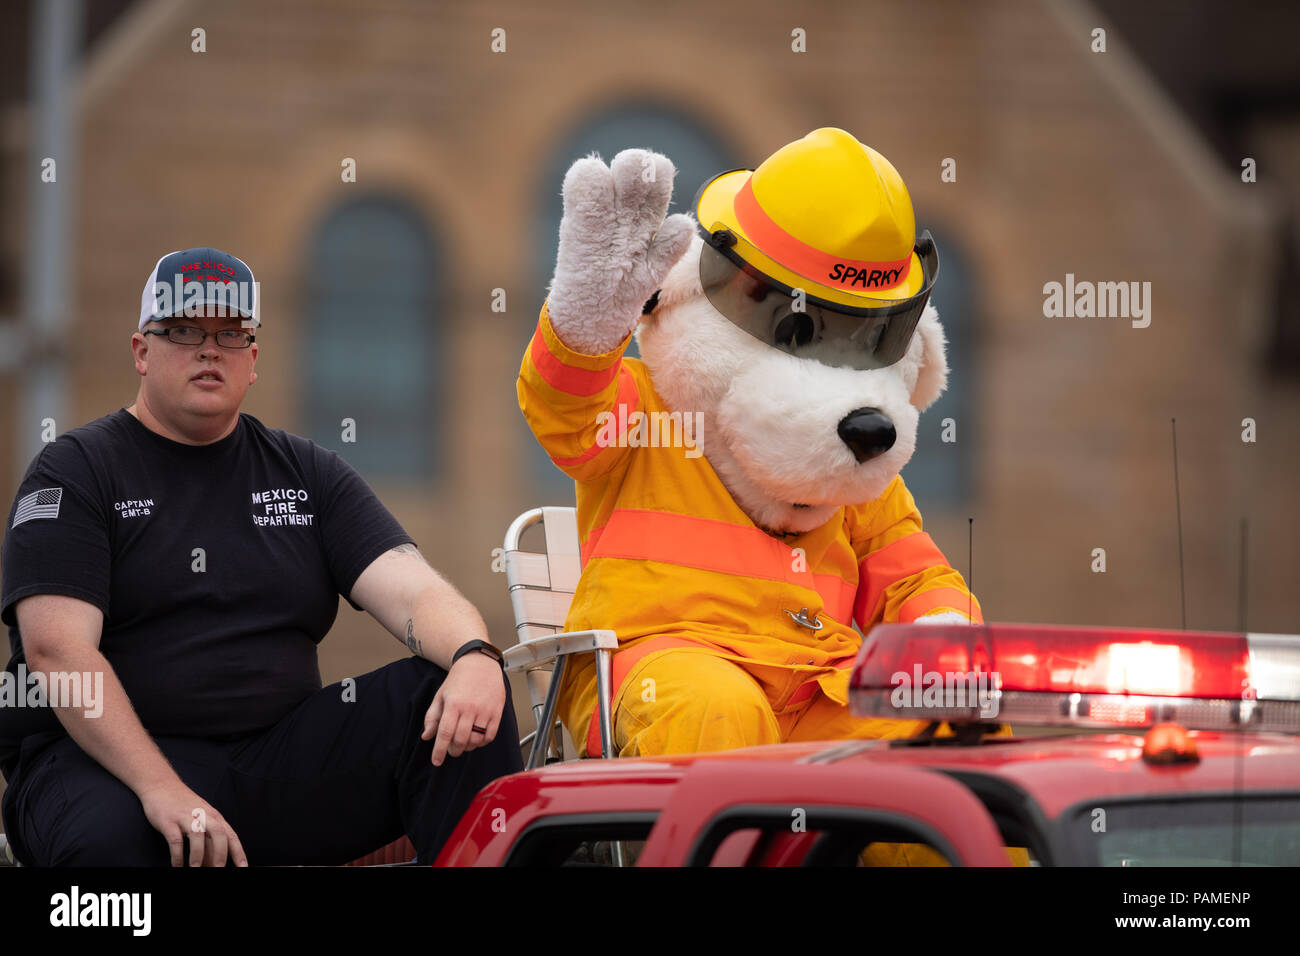 Fire Department Mascot Stock Photos